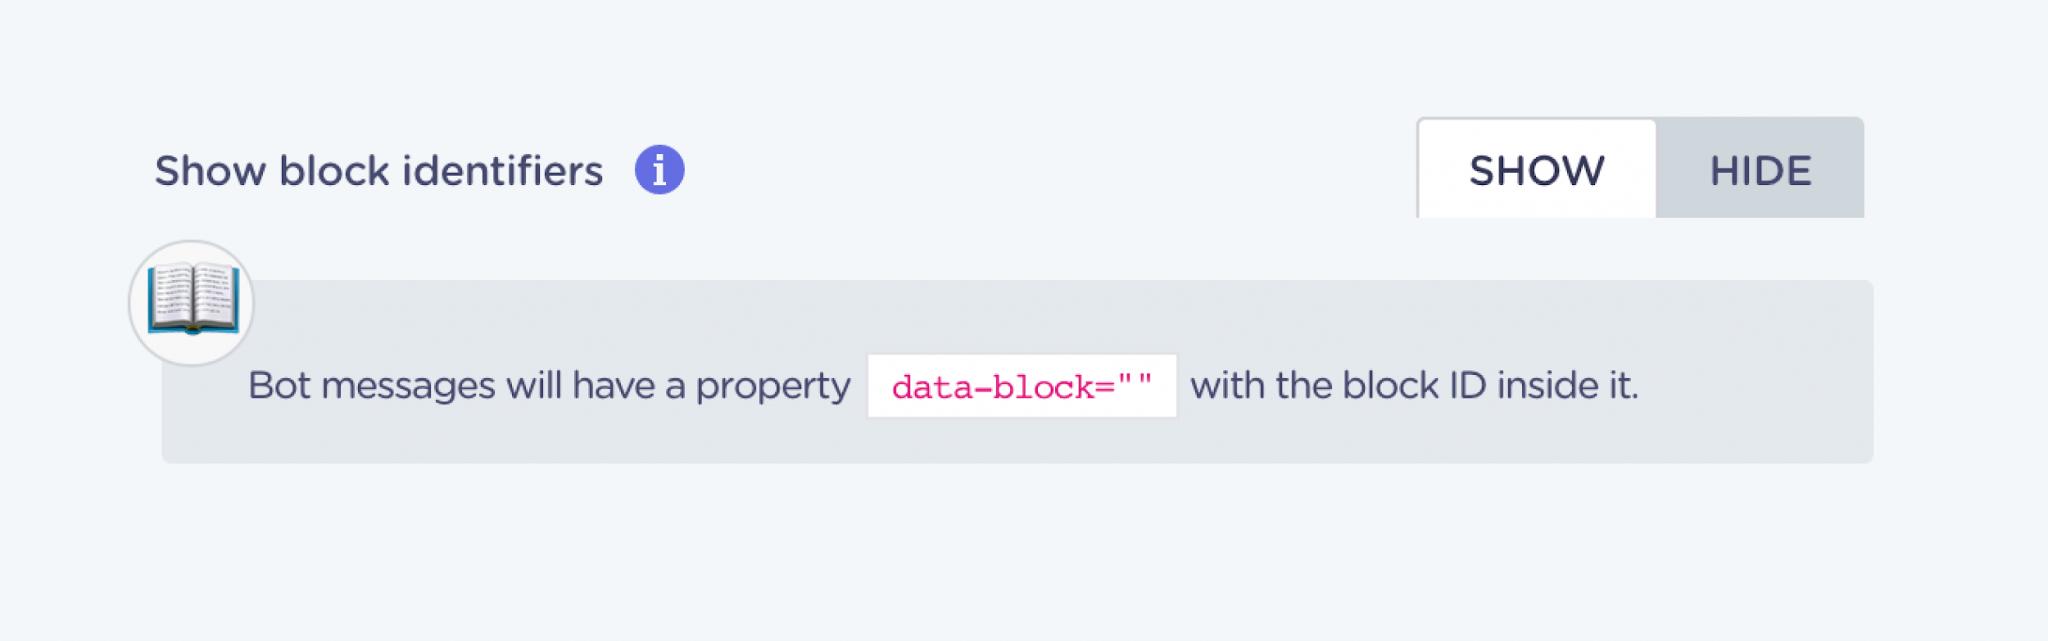 landbot v3 feature block ID identifier